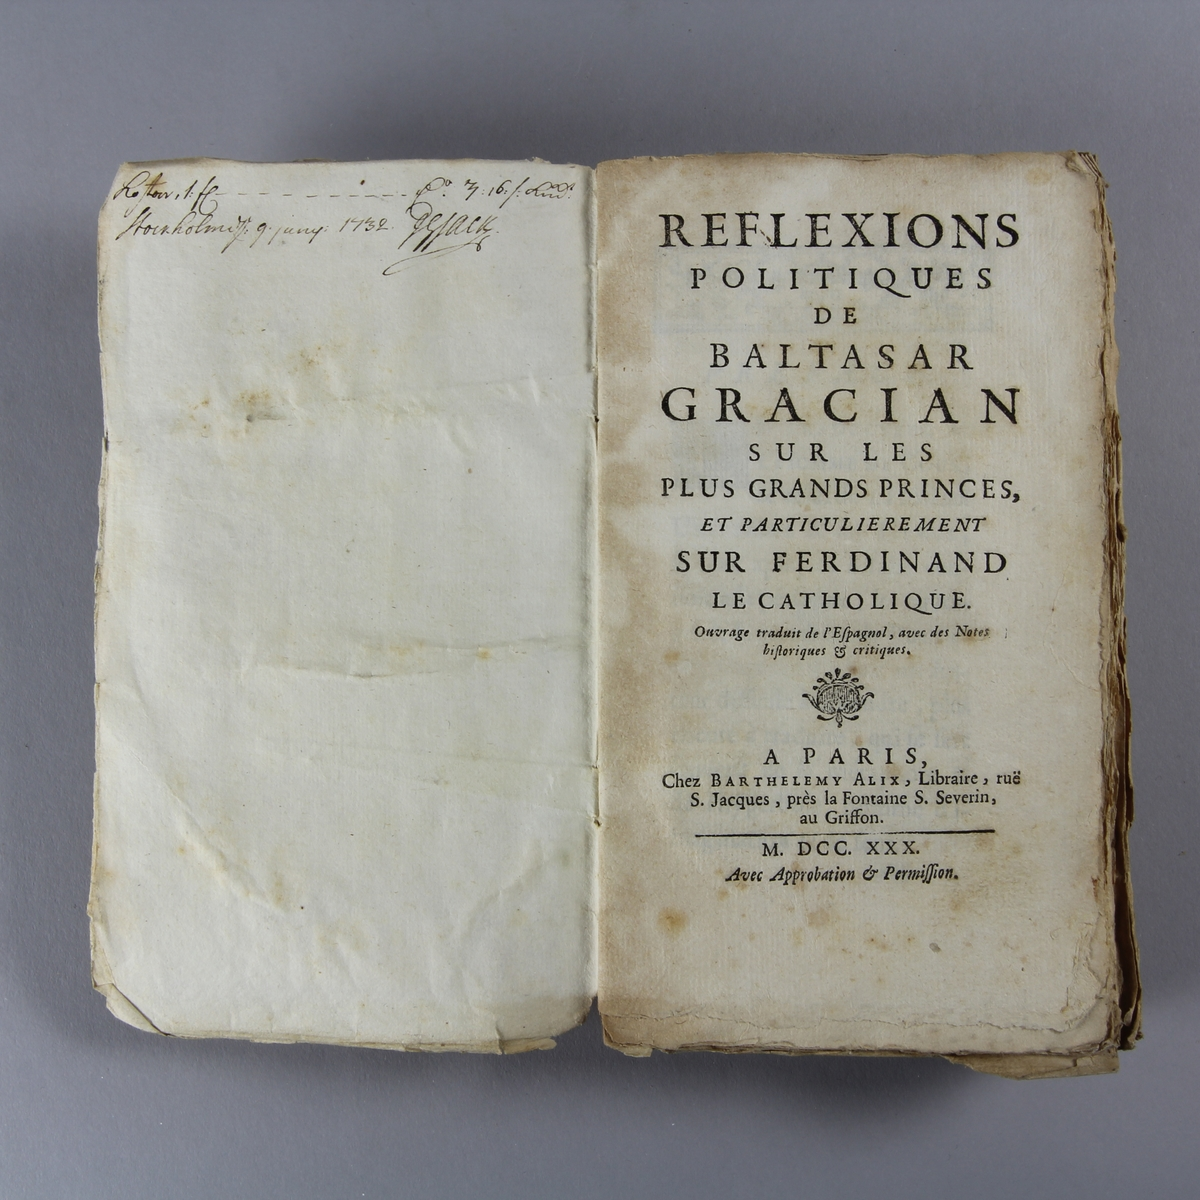 "Bok, häftad, ""Reflexions politiques de Baltasar Gracian sur le plus grand princes et particulierment sur Ferdinand le catholique"". Pärm av marmorerat papper, oskuret snitt. Anteckning om förvärv."